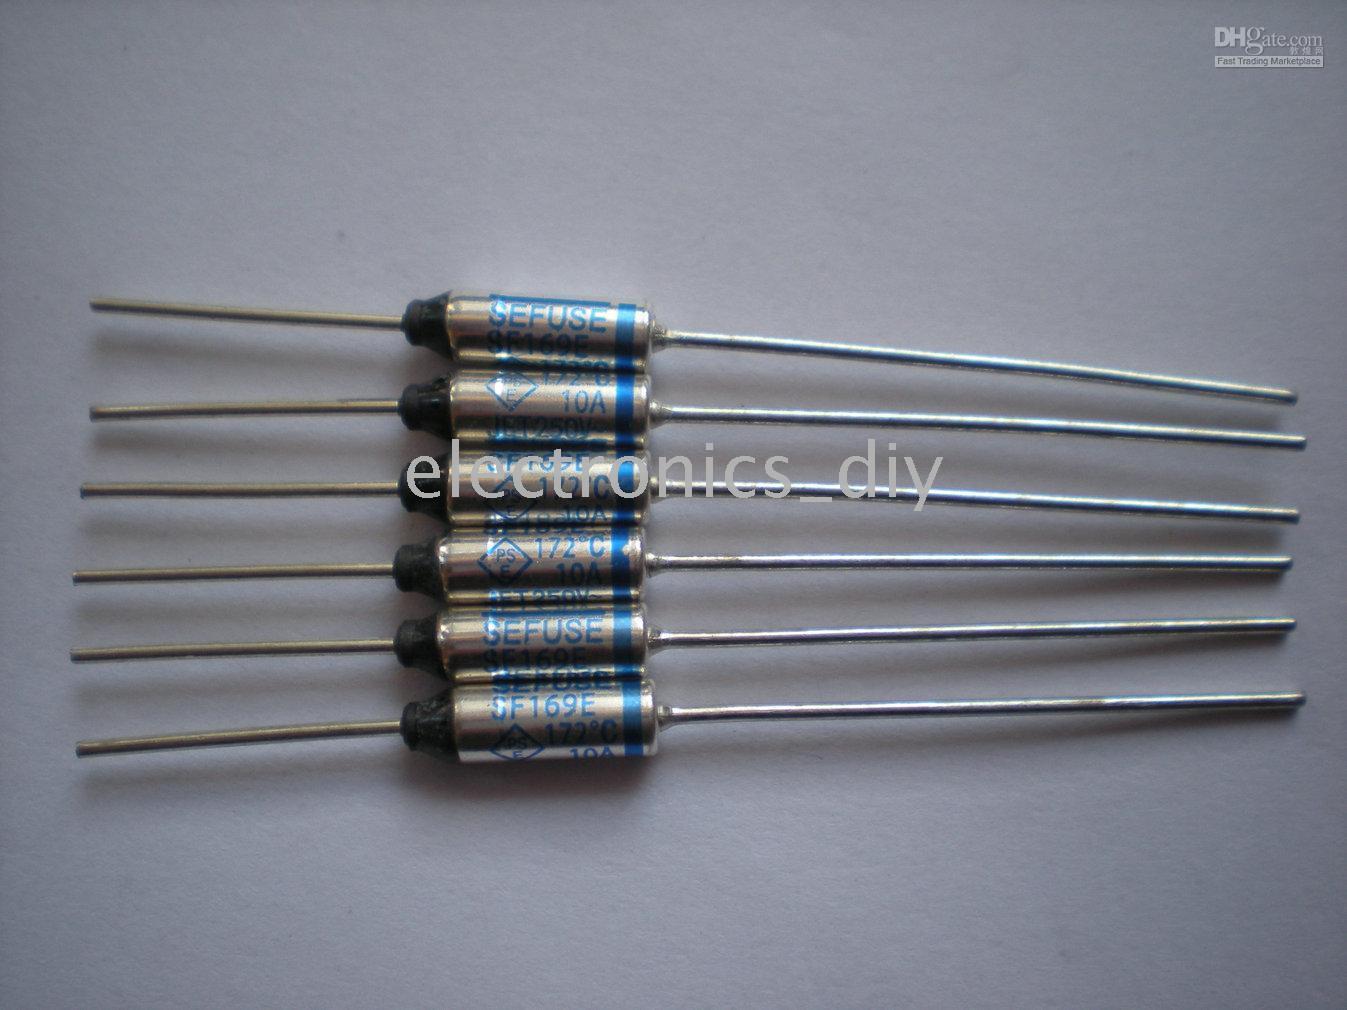 best selling microtemp Thermal Fuse 172C degree TF Cut-off 10A 250V SF169E 200 Pcs per lot